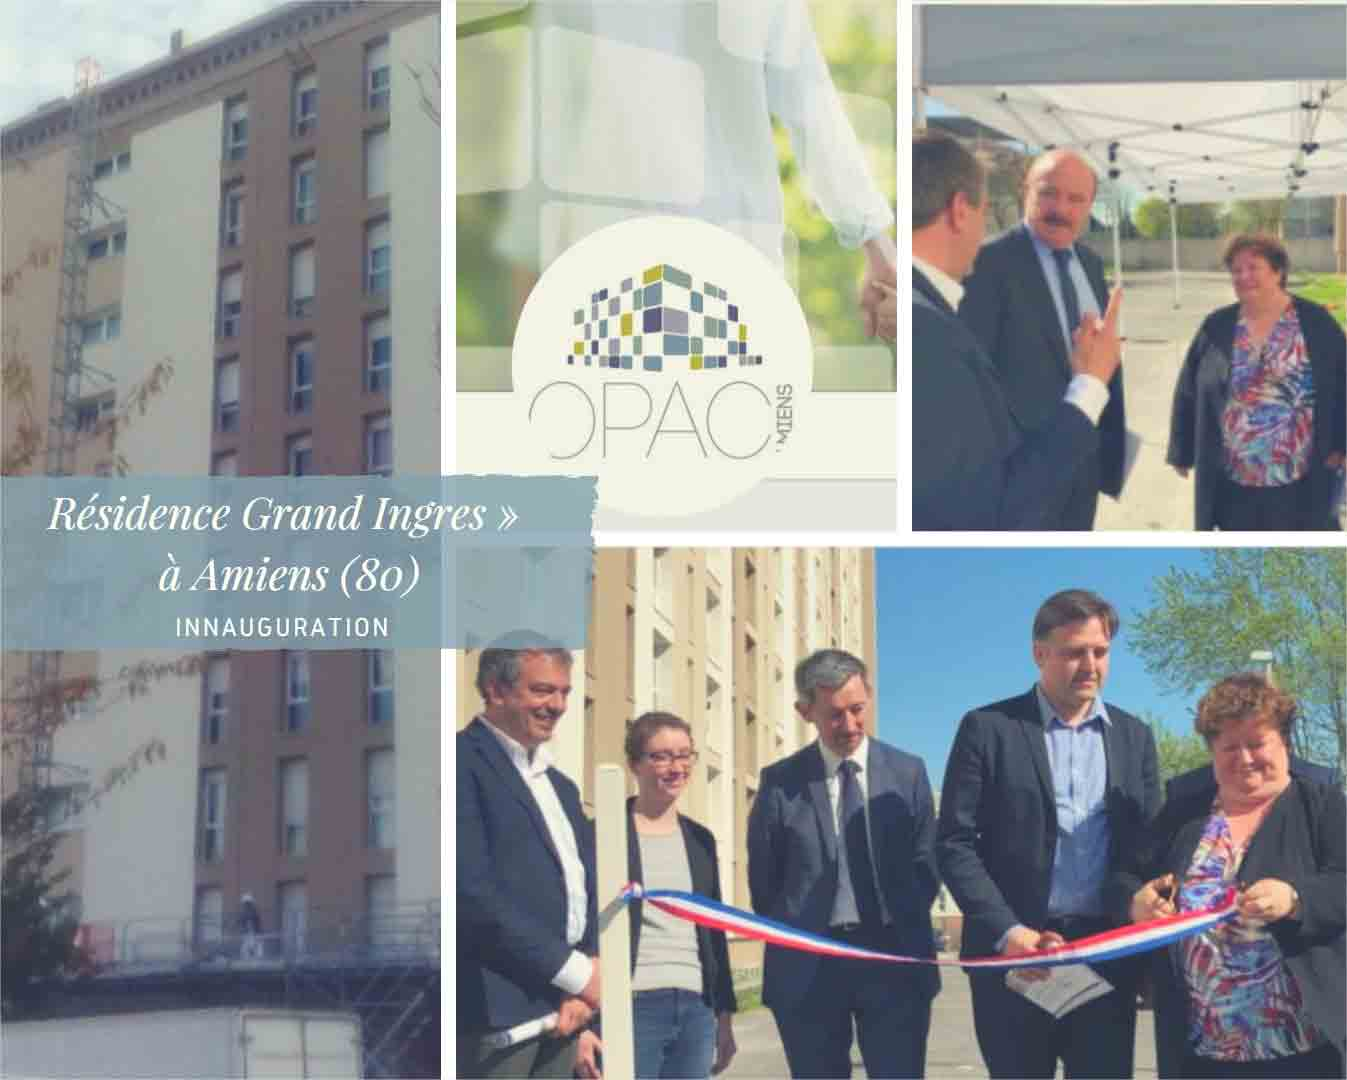 Inauguration Opac d'Amiens